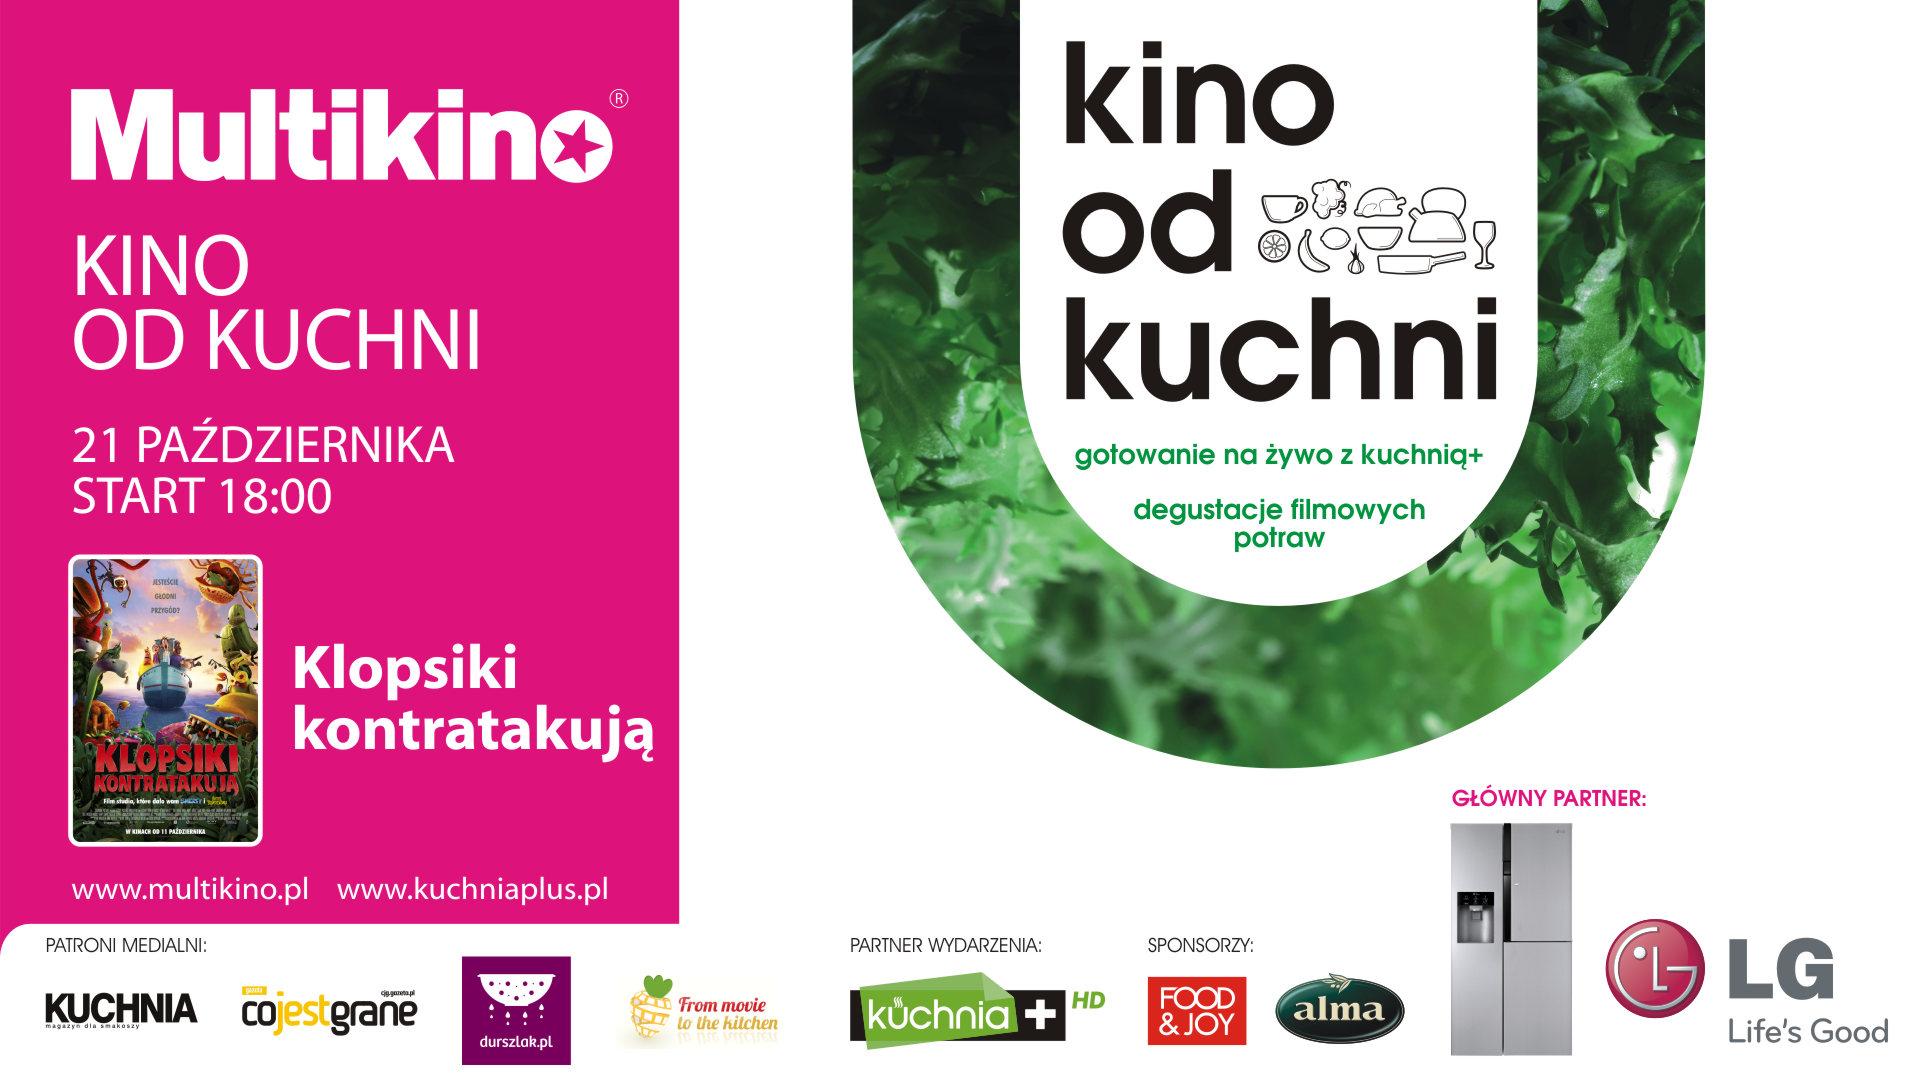 LCD-Kino_od_kuchni-Klopsiki